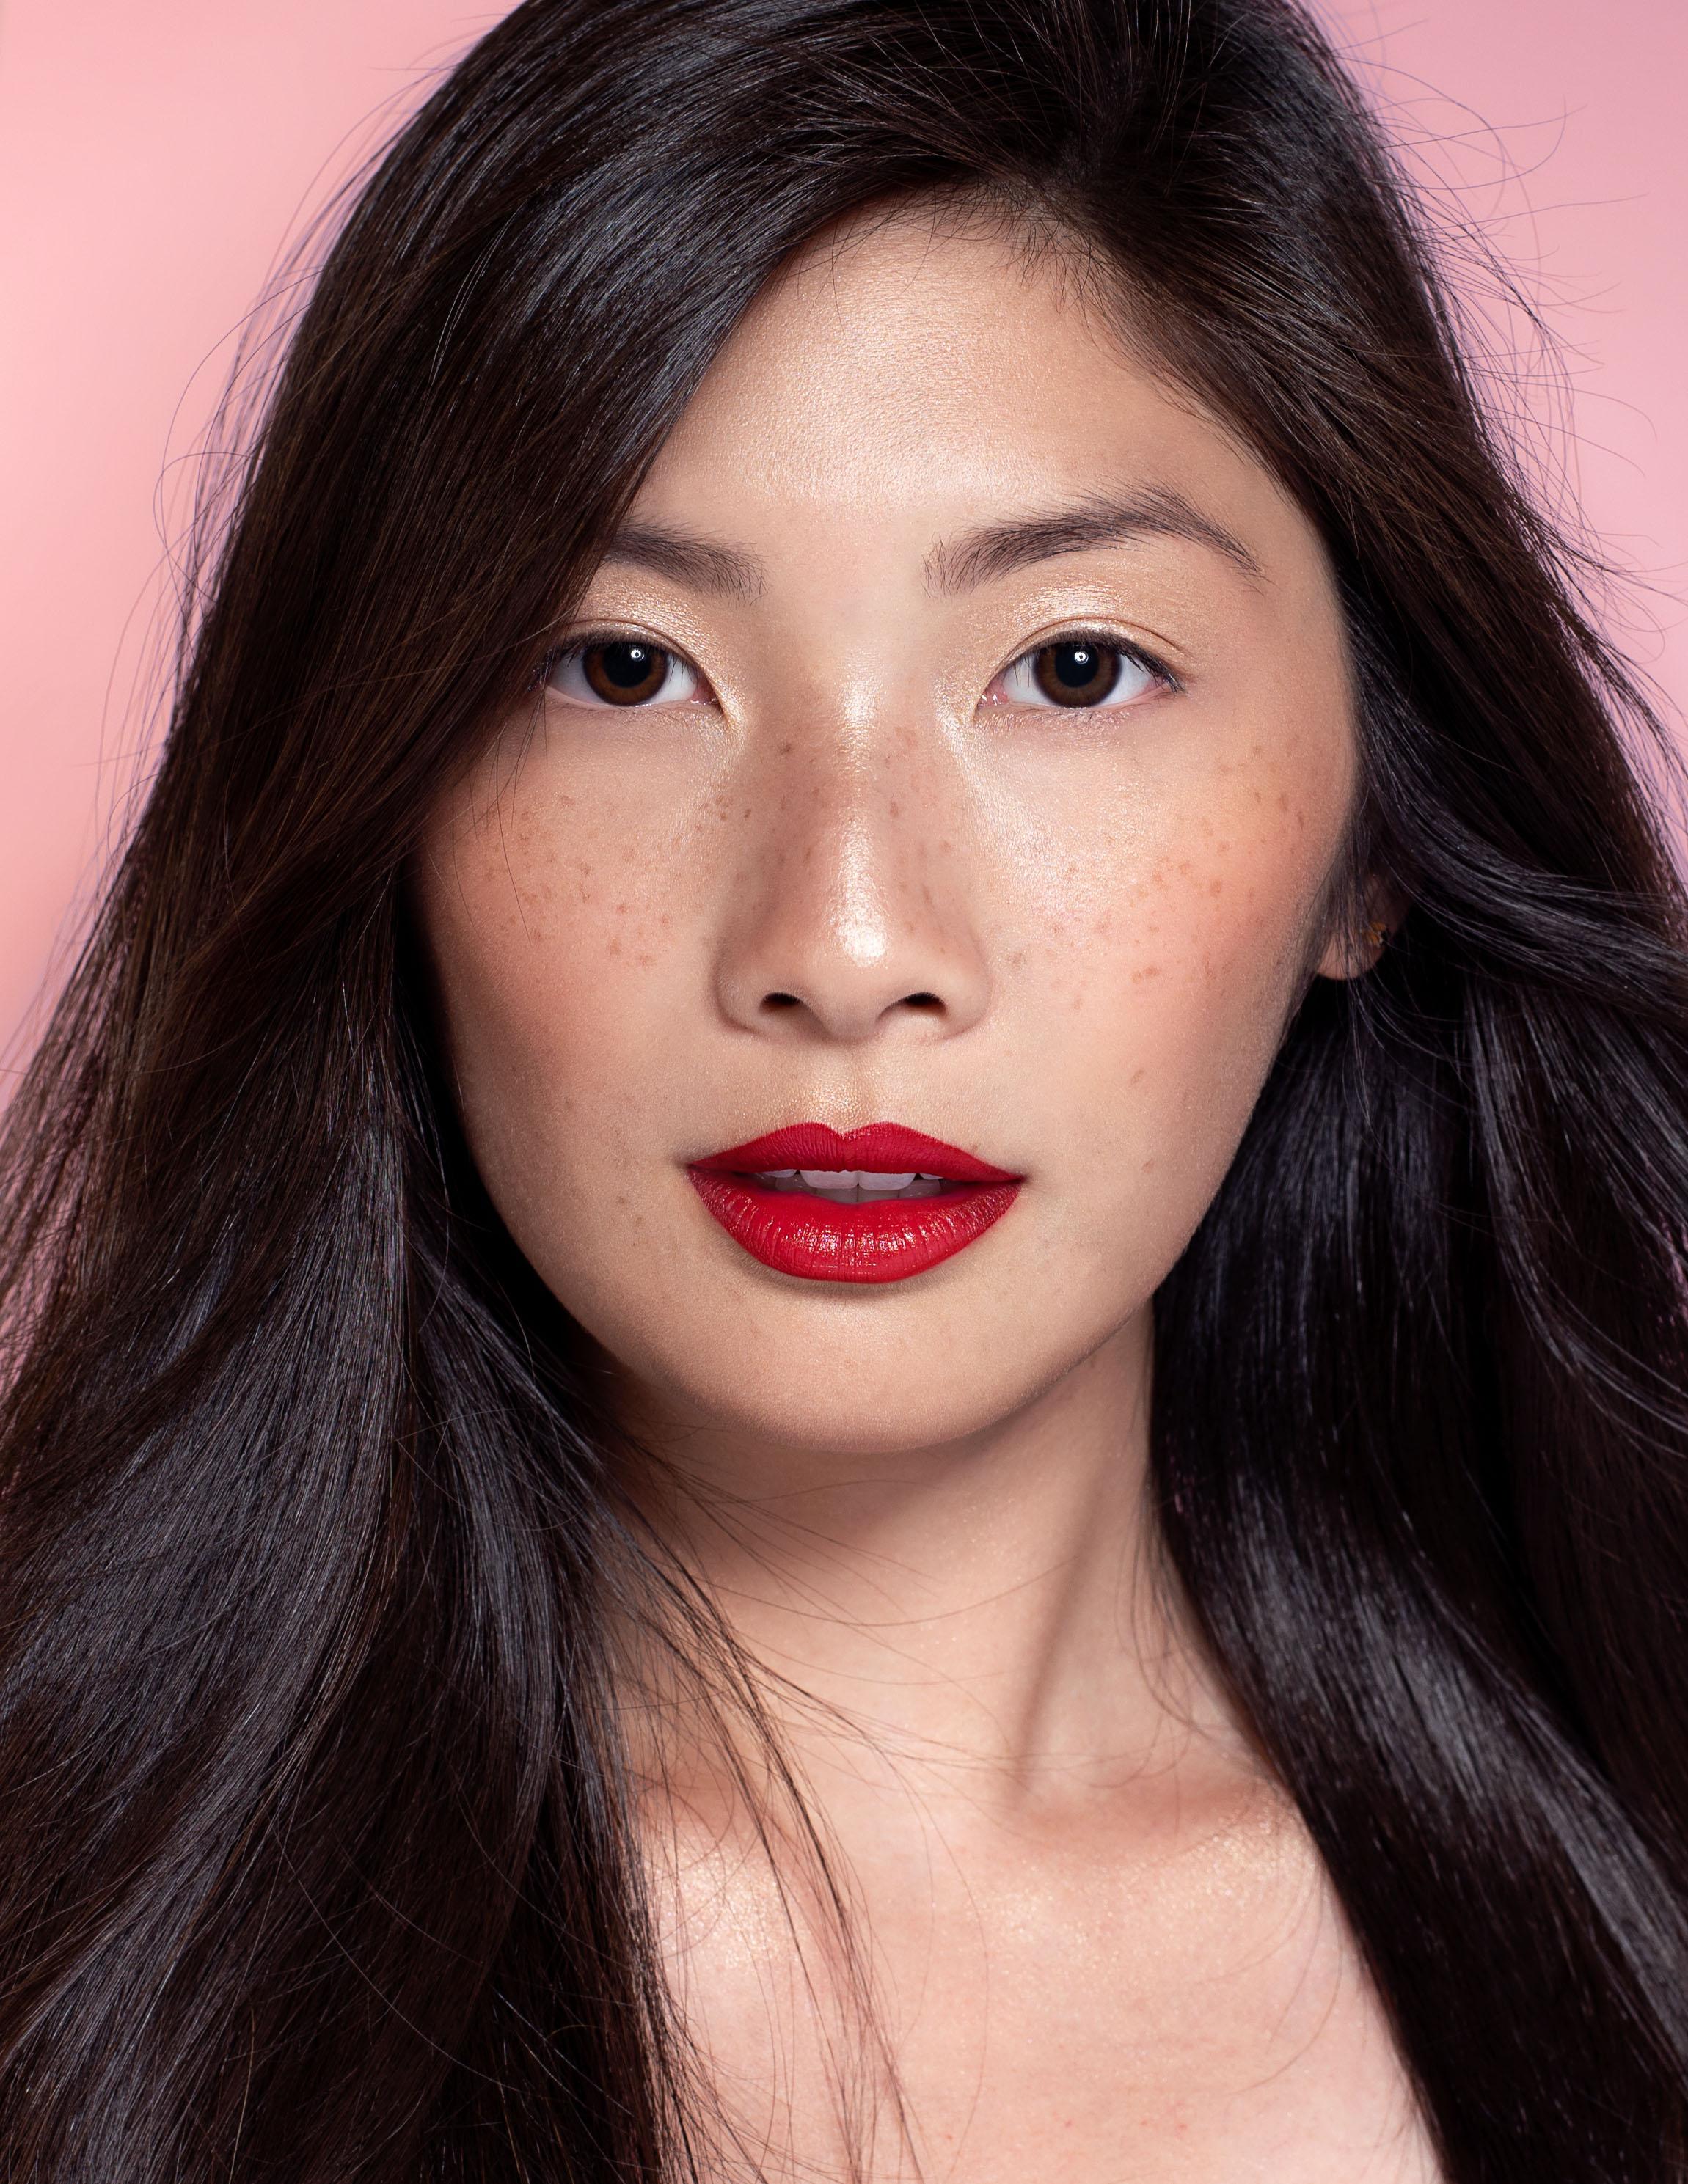 Beauty-Hue-Linh-127-Edit.jpg